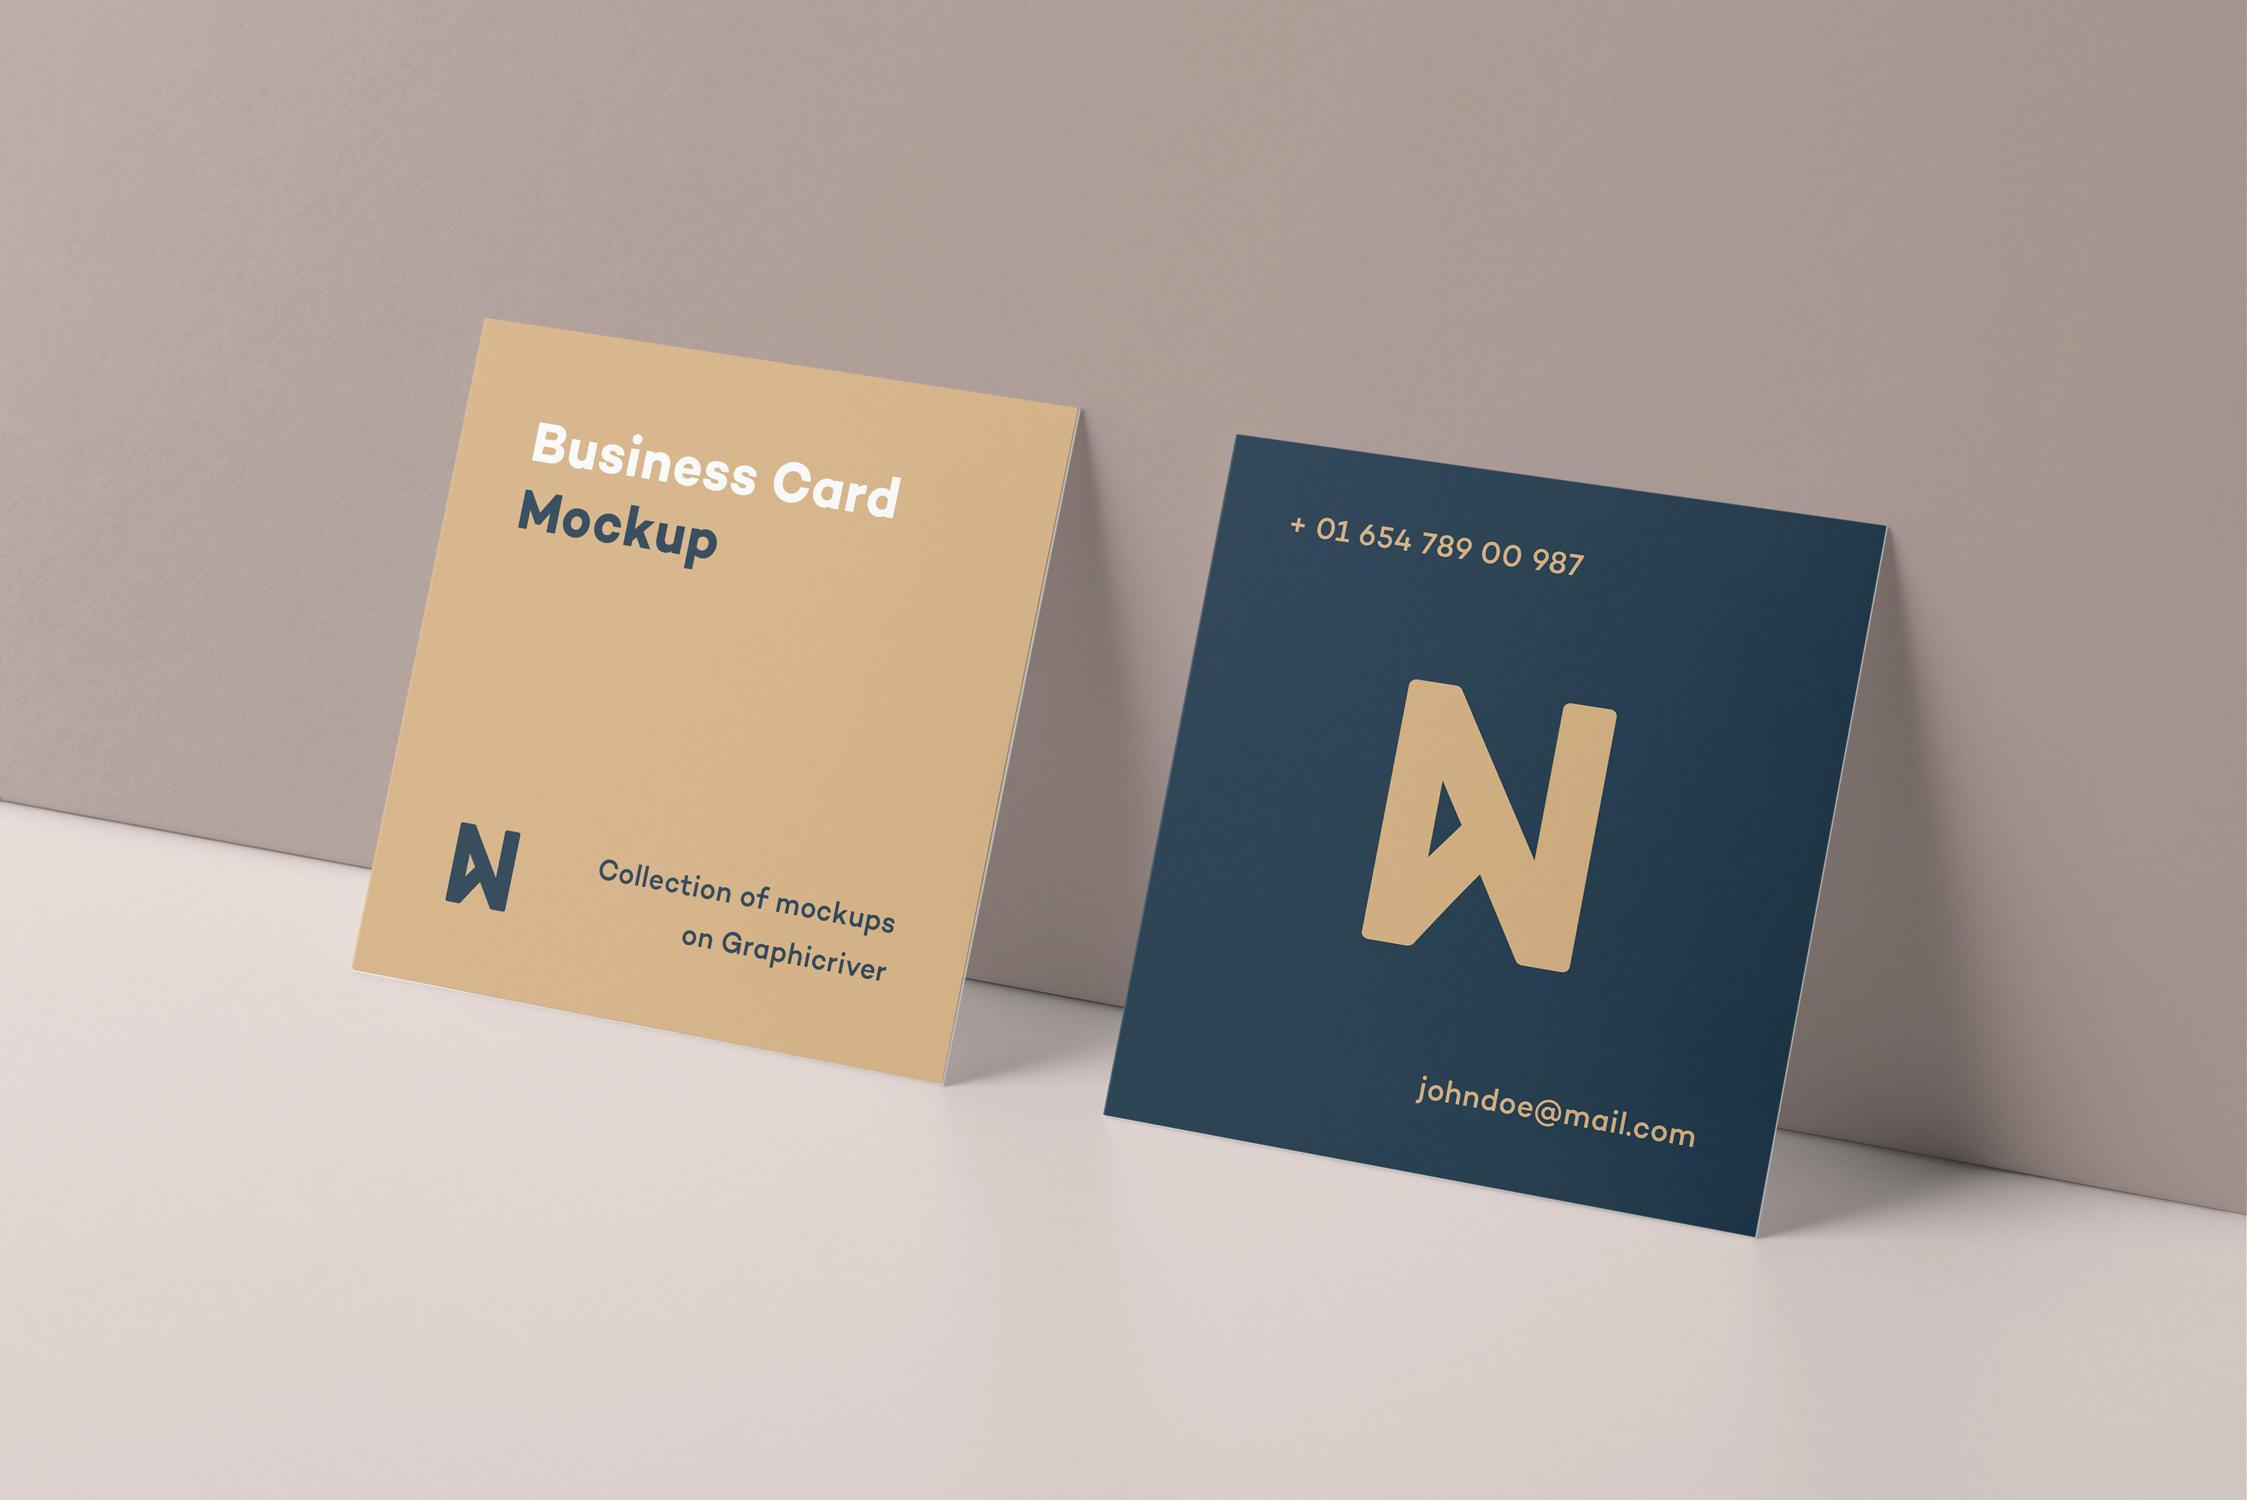 Ariella Ferrer card & paper projects   photos, videos, logos, illustrations